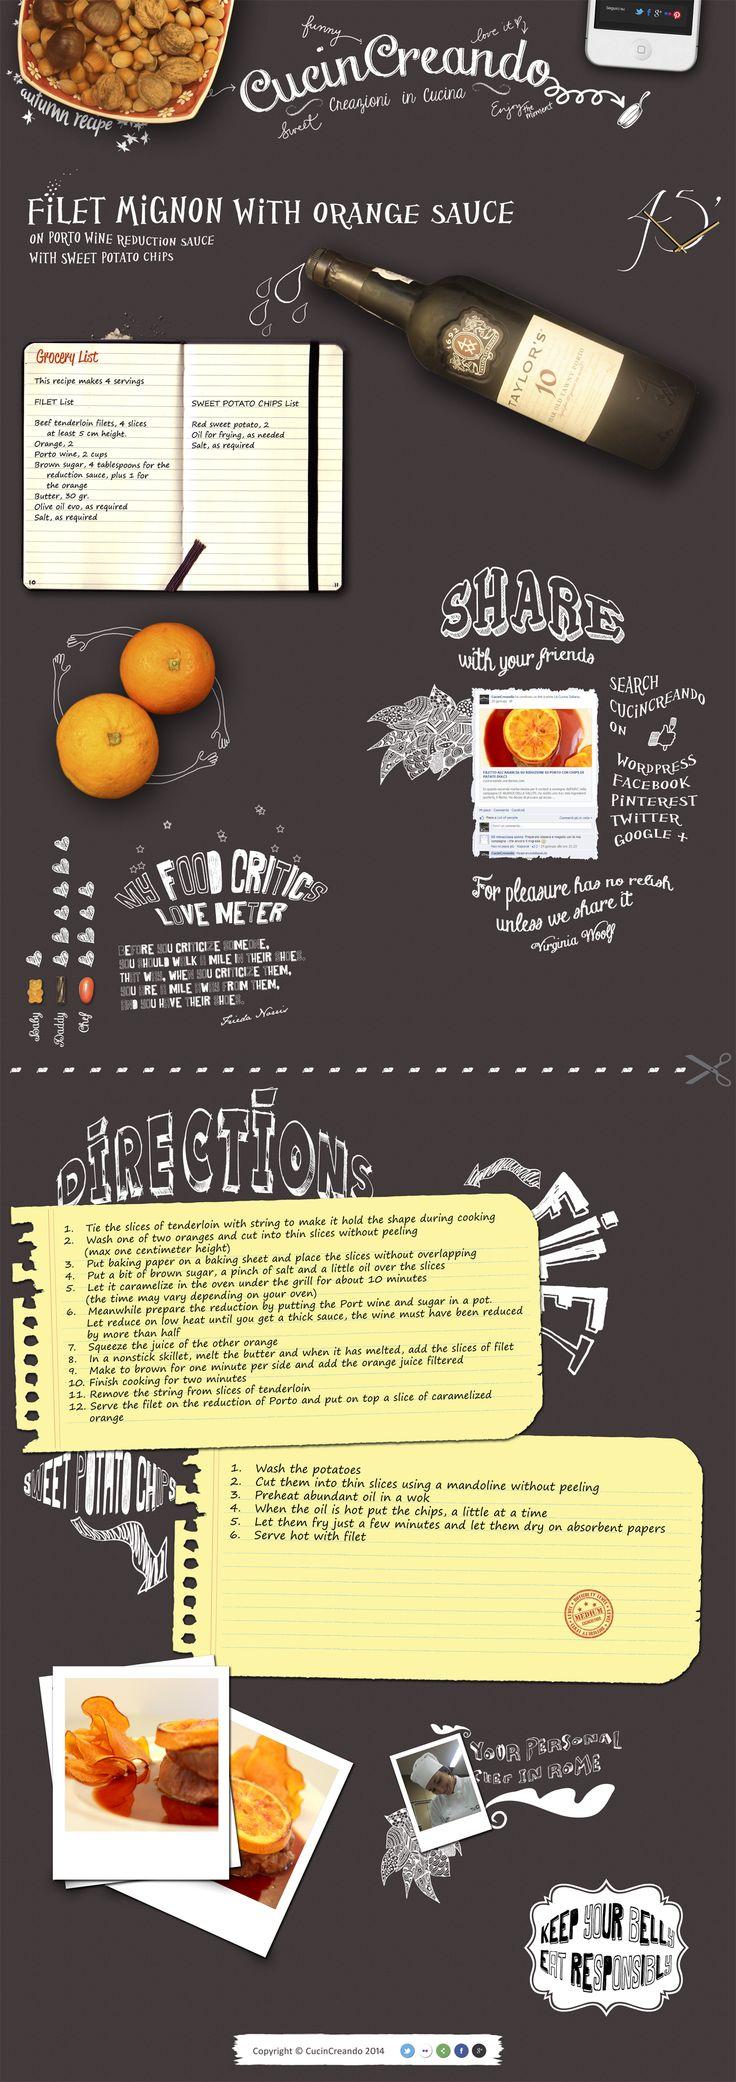 FIlet mignon on Porto wine reduction and orange sauce